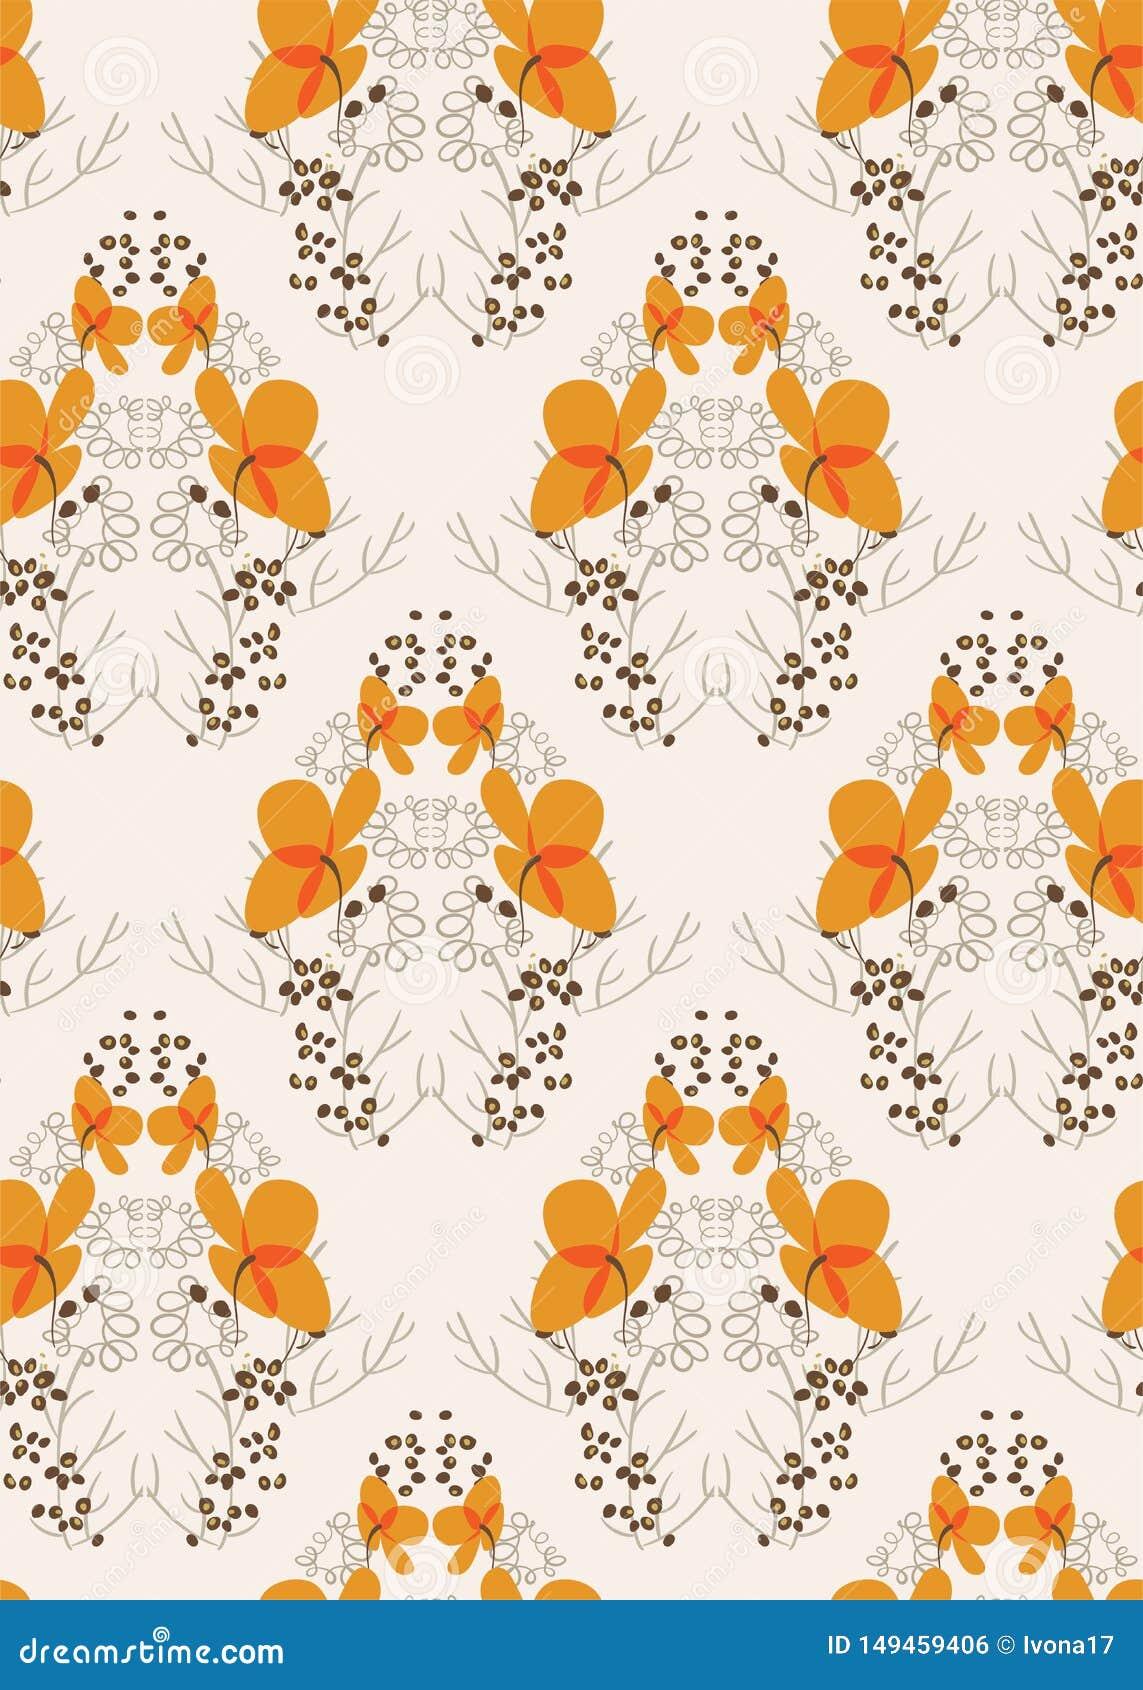 Orange flower seamless pattern vector floral design primitive scandinavian